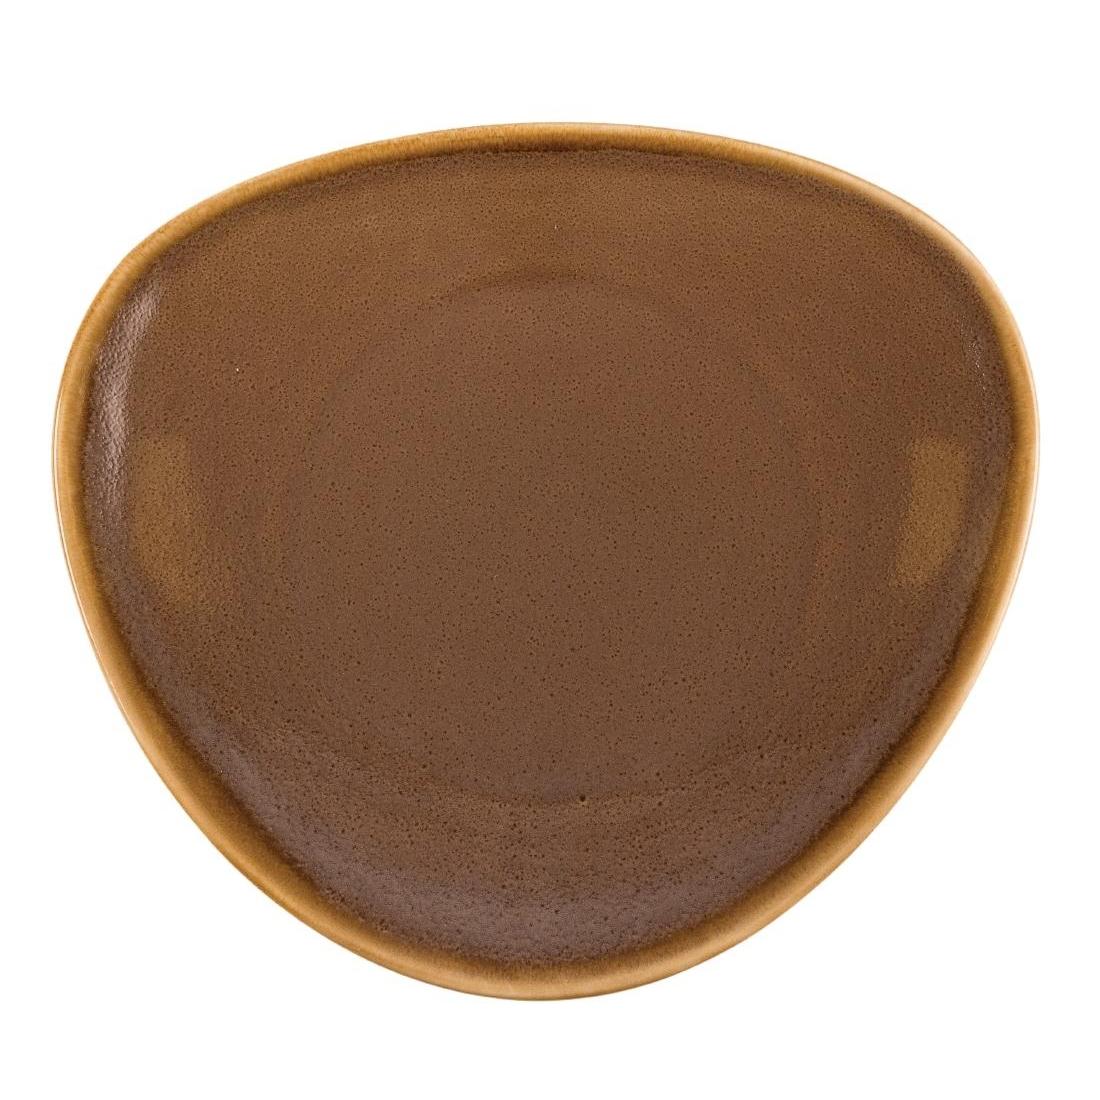 Assiette triangulaire couleur écorce Olympia Kiln 280mm